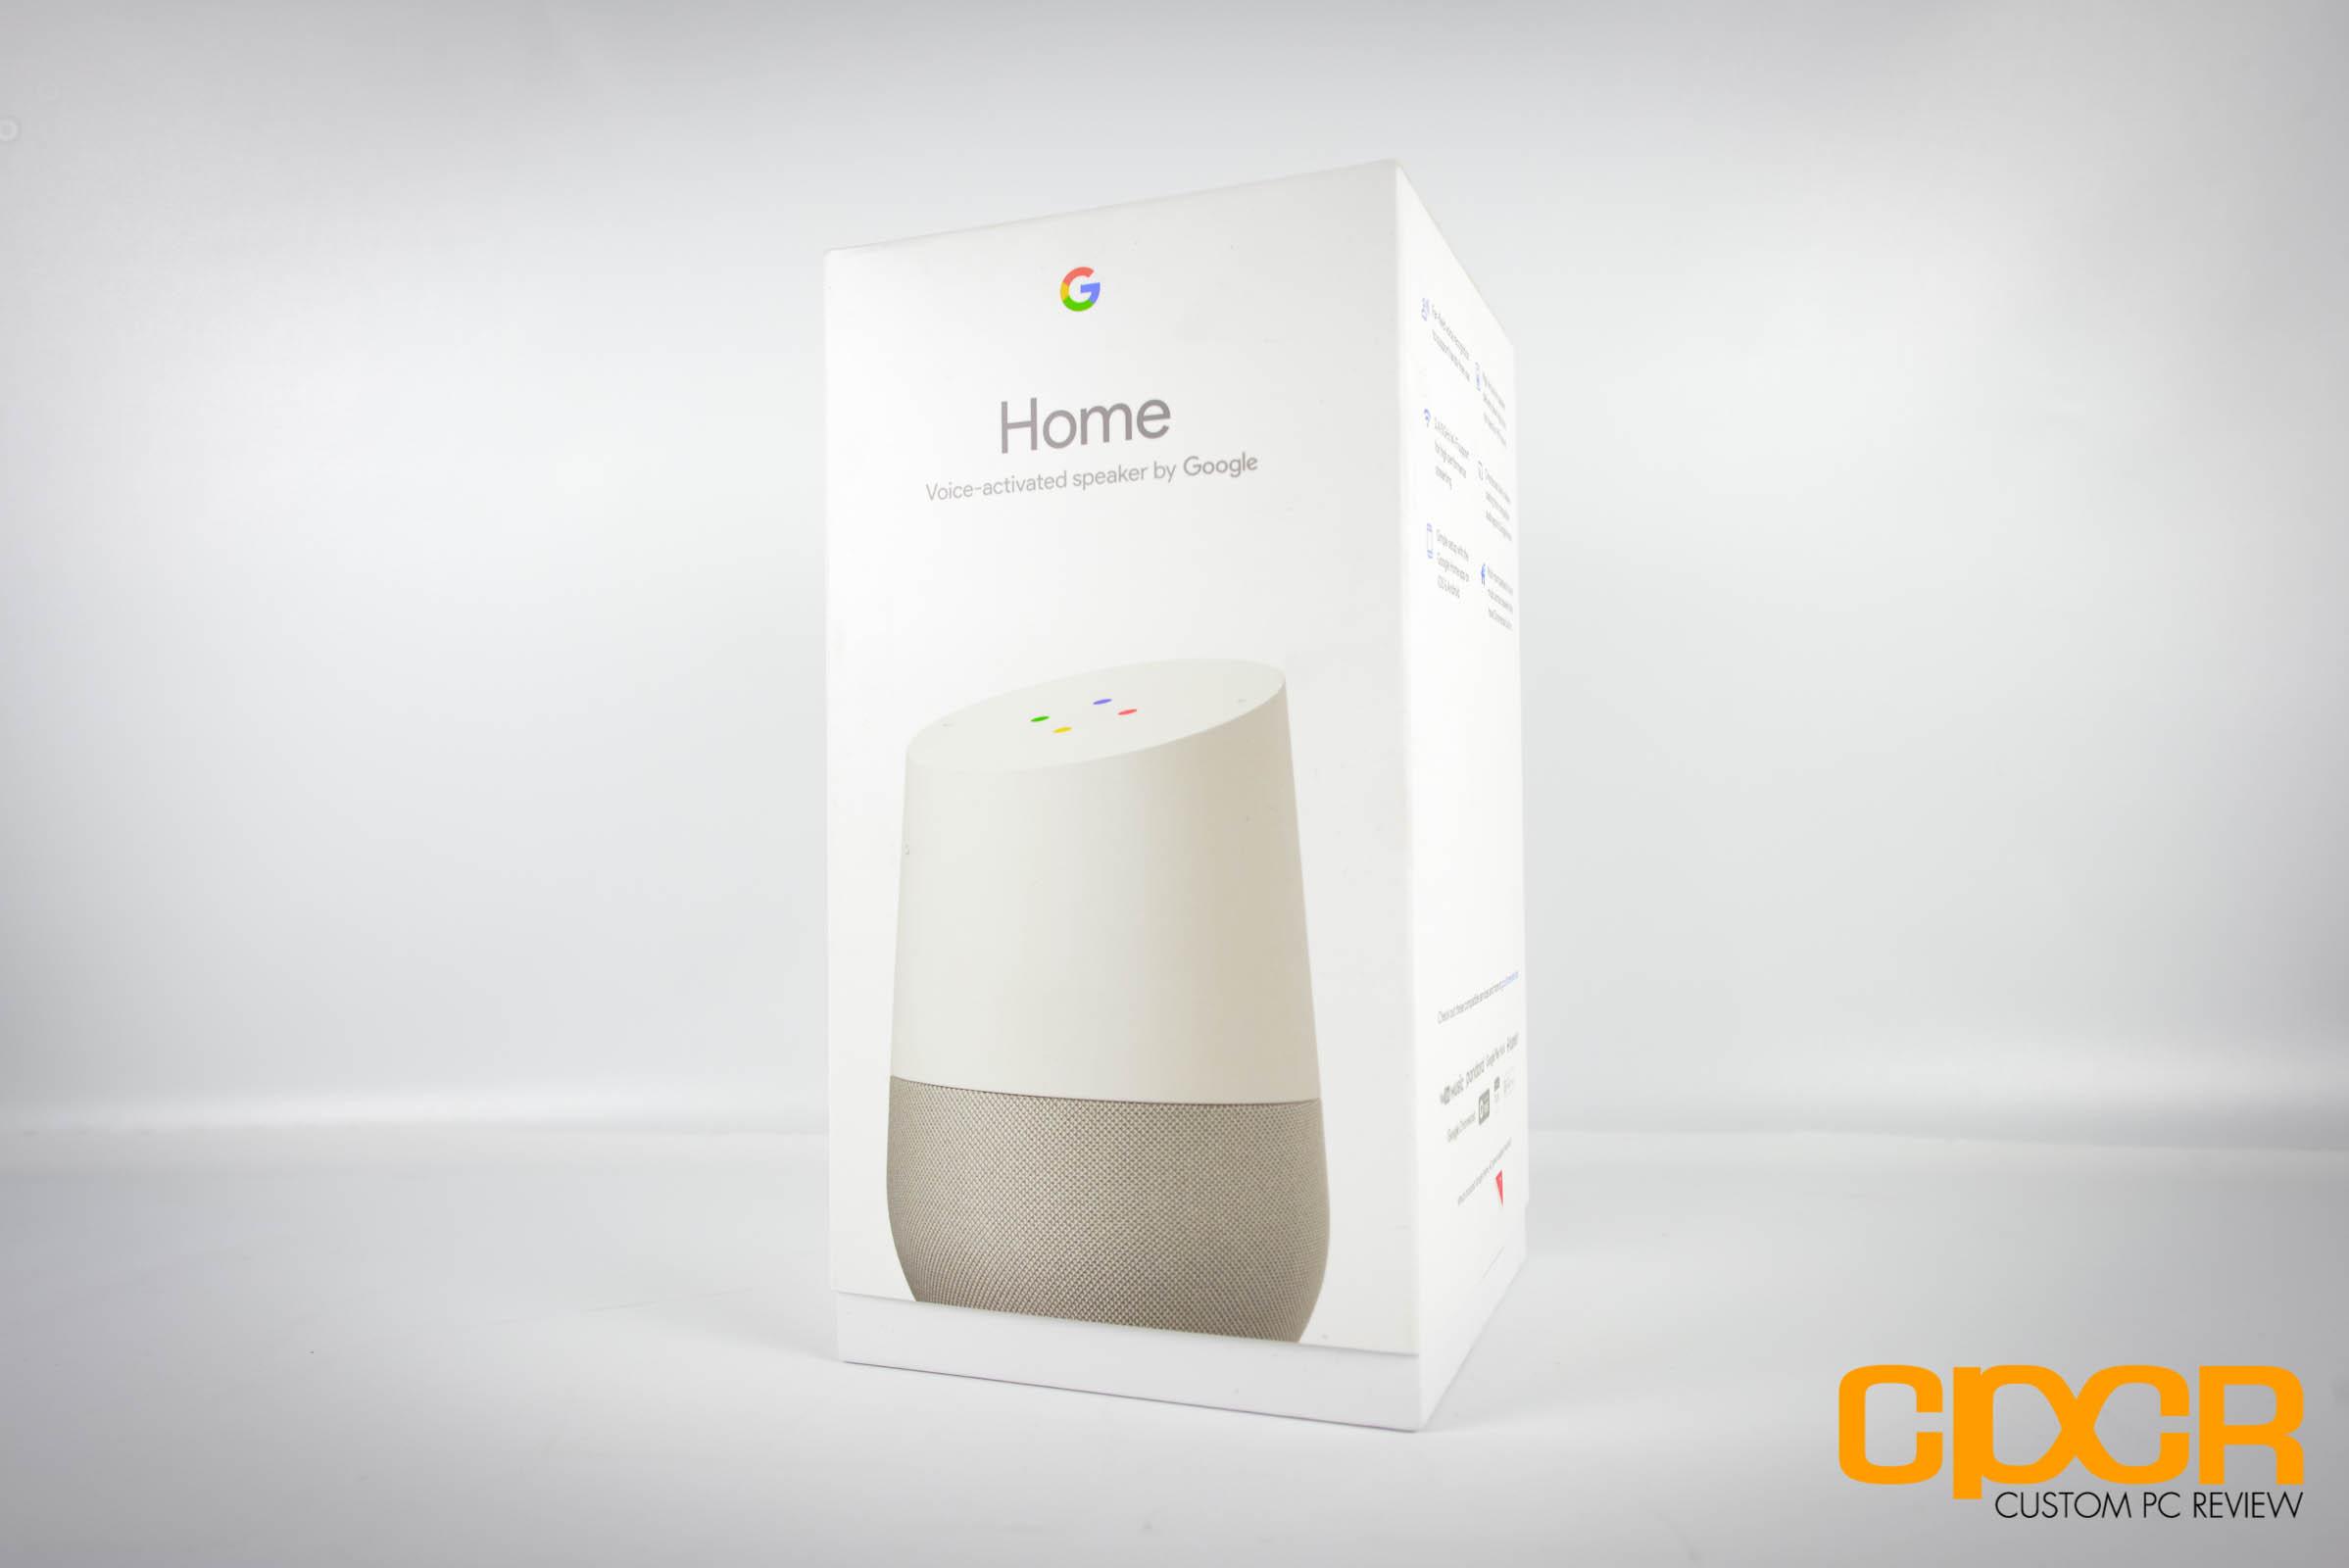 review google home smart speaker a good start custom pc review. Black Bedroom Furniture Sets. Home Design Ideas